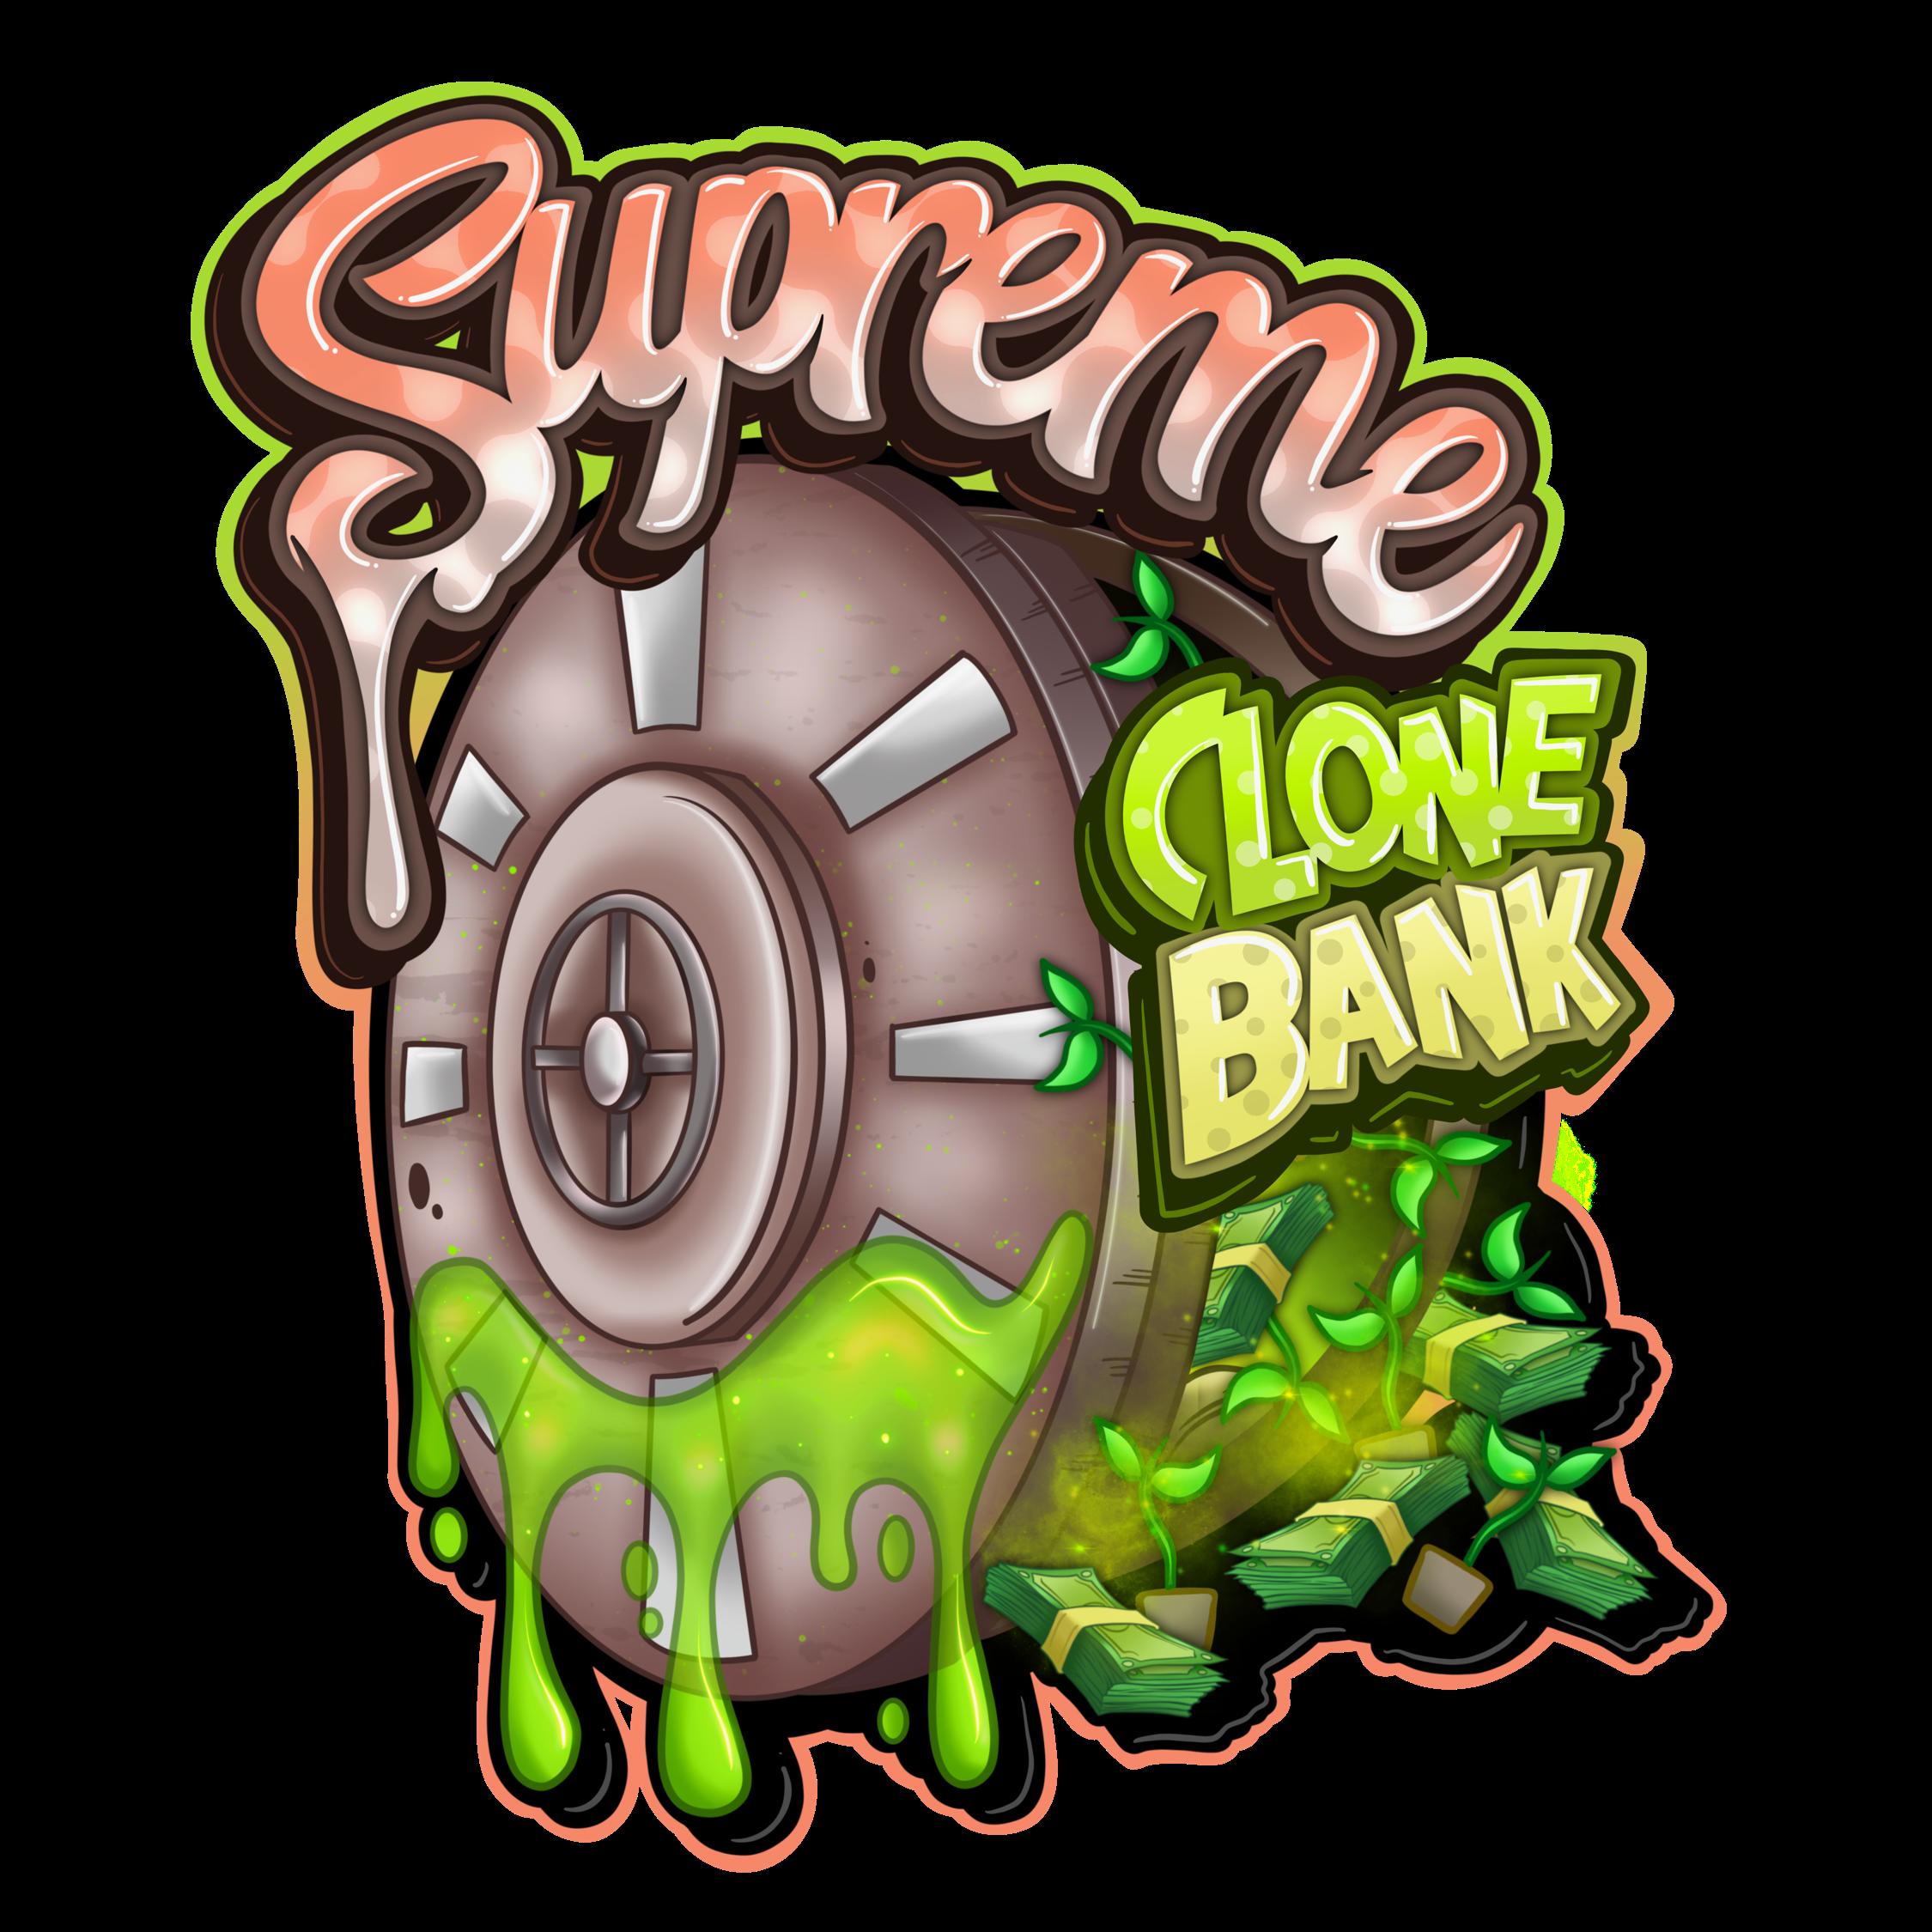 Supreme Clone Bank